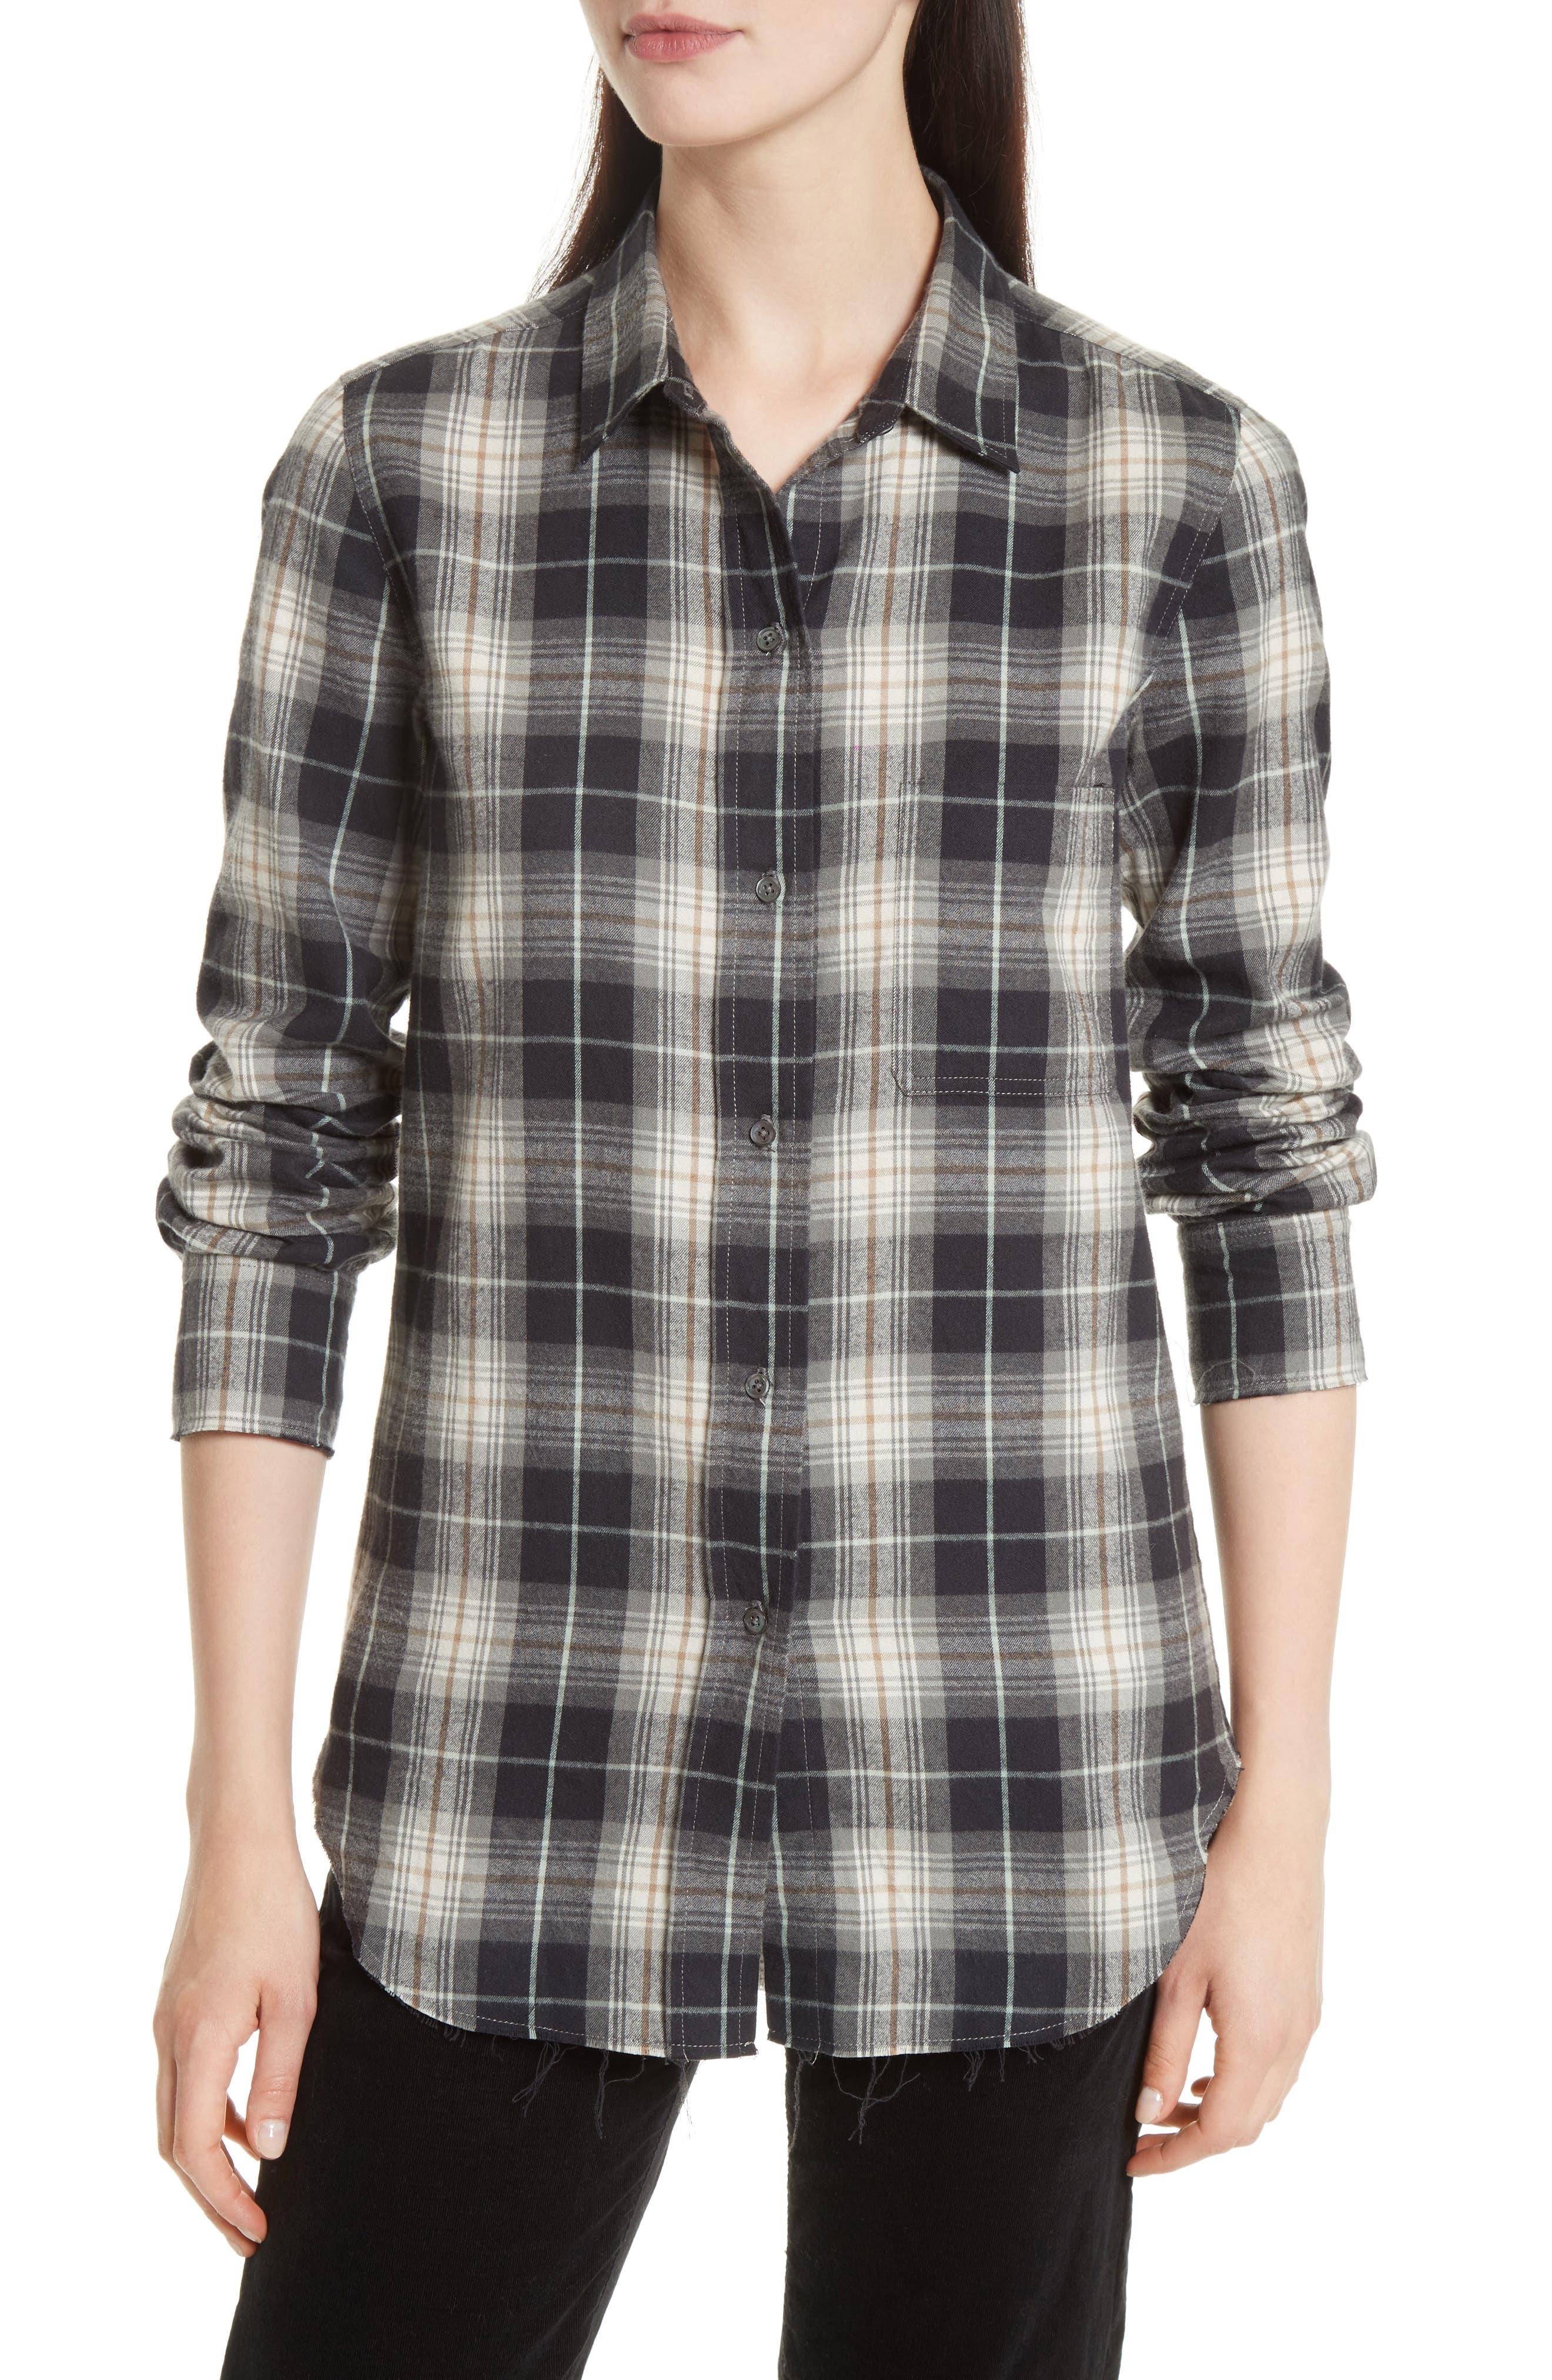 Alternate Image 1 Selected - Vince Tartan Plaid Oversize Shirt